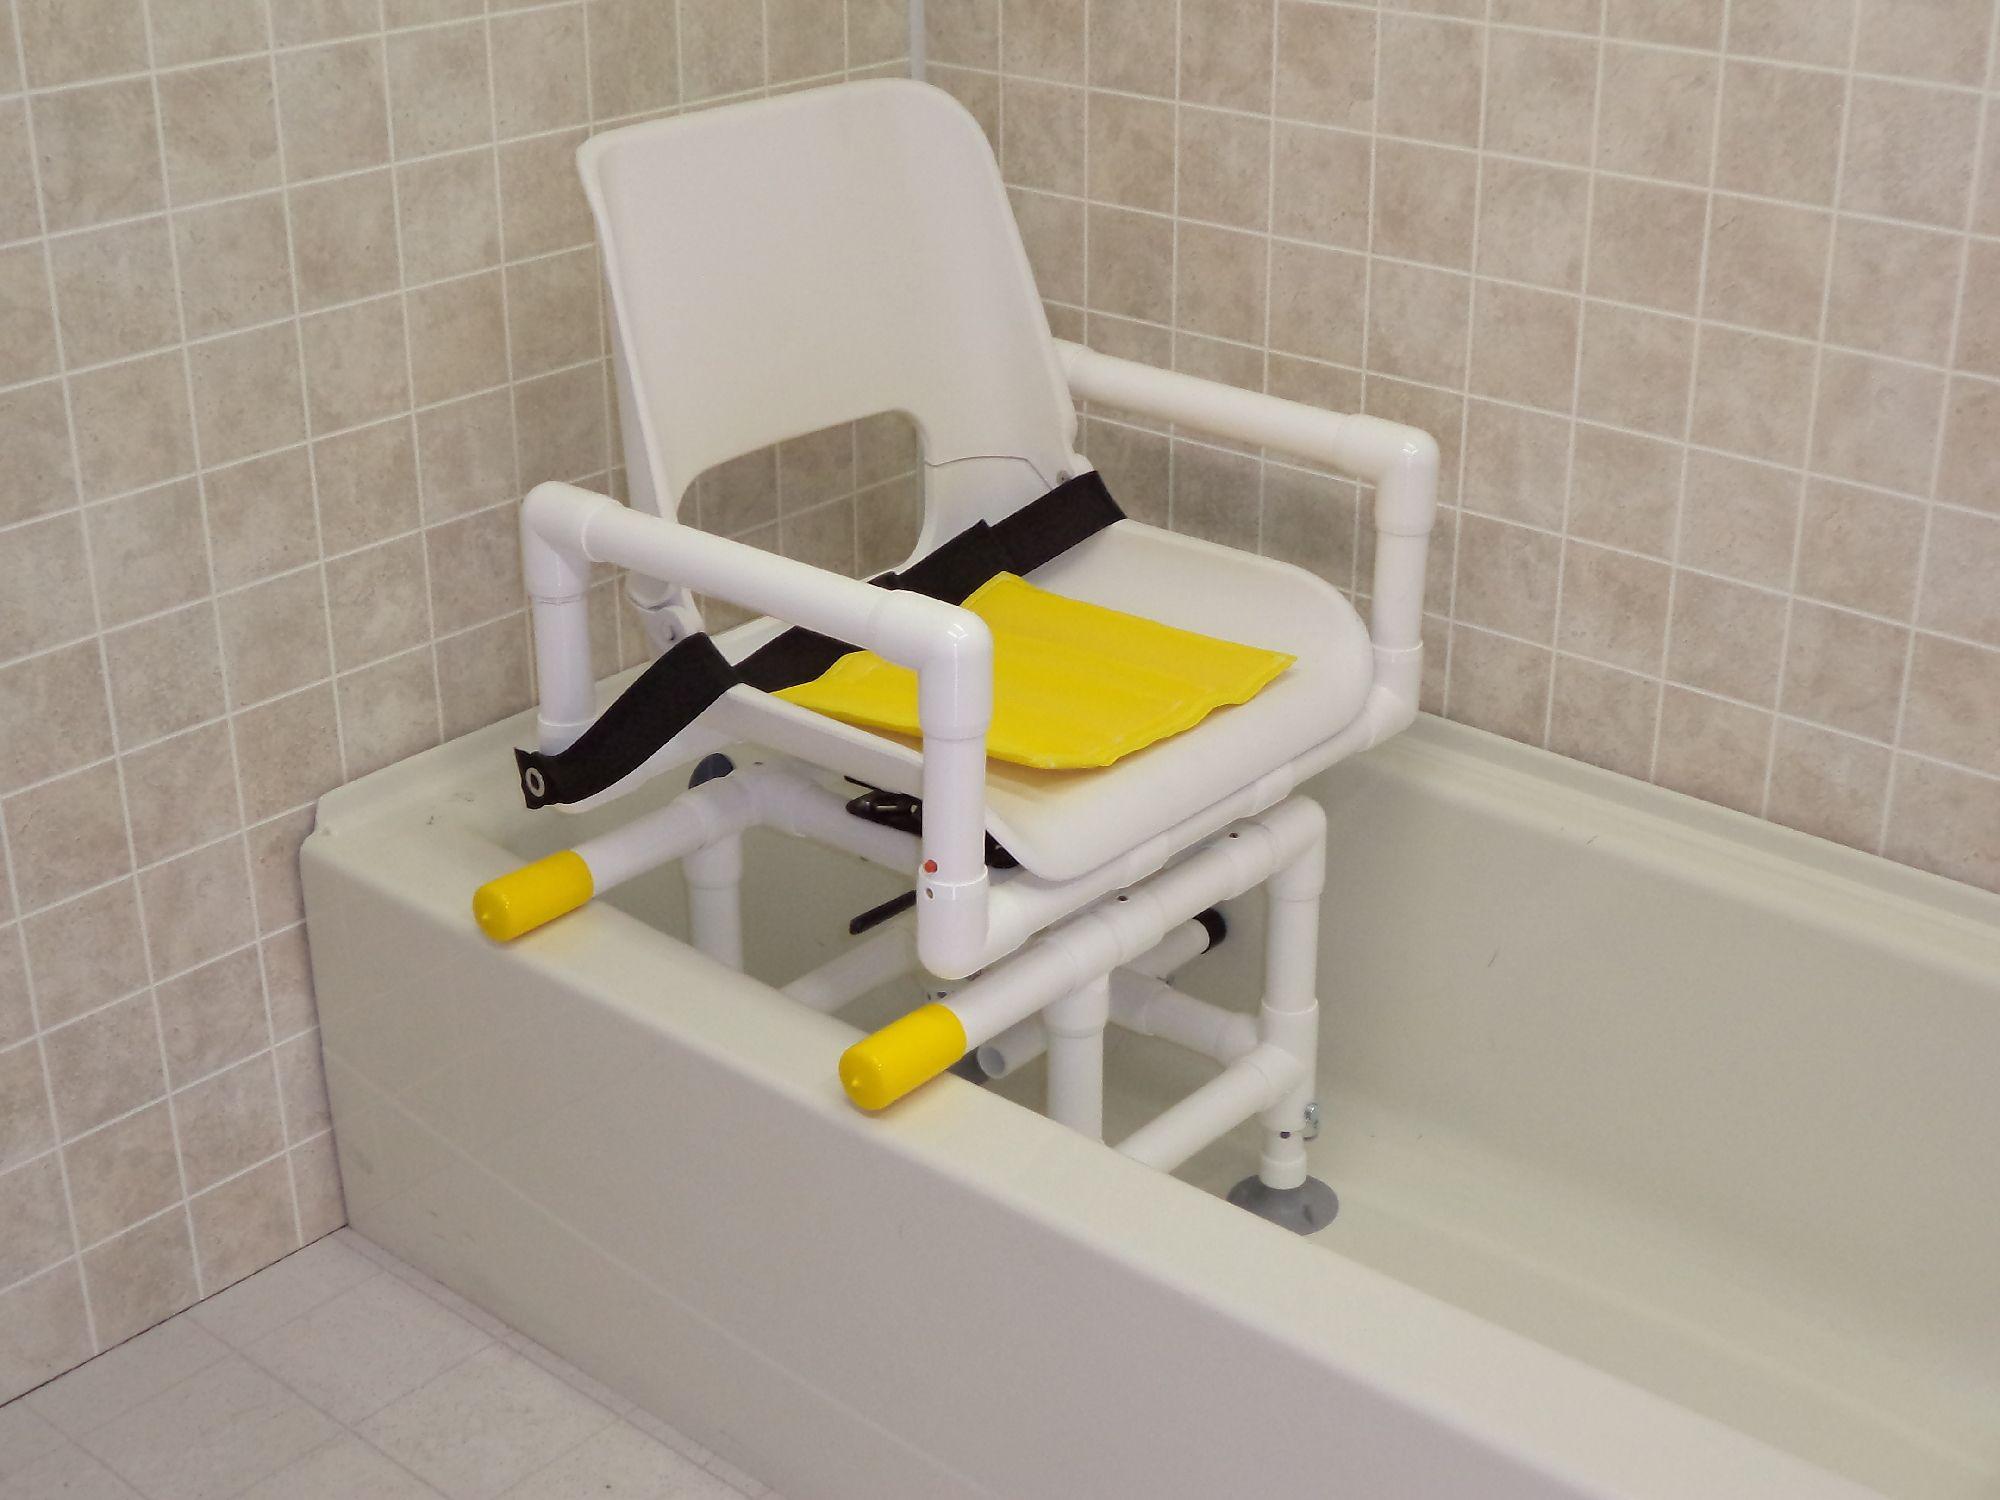 The ICC Swivel Bath Chair has an ergonomic seat that rotates 360